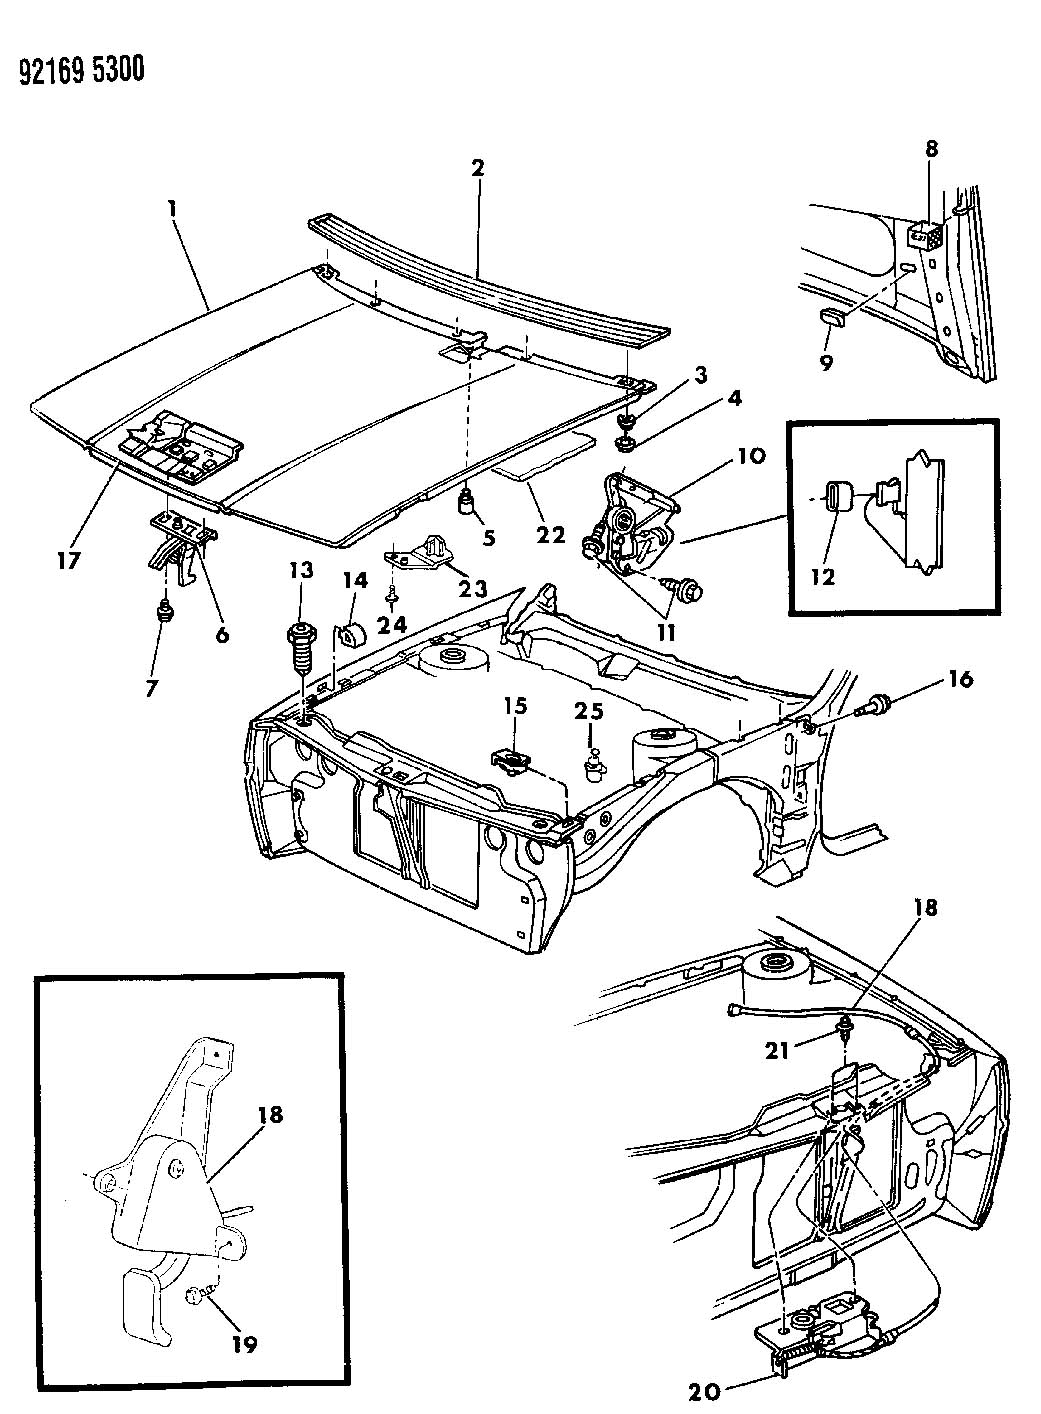 1992 Chrysler Lebaron HOOD AND HOOD RELEASE J BODY 21,27